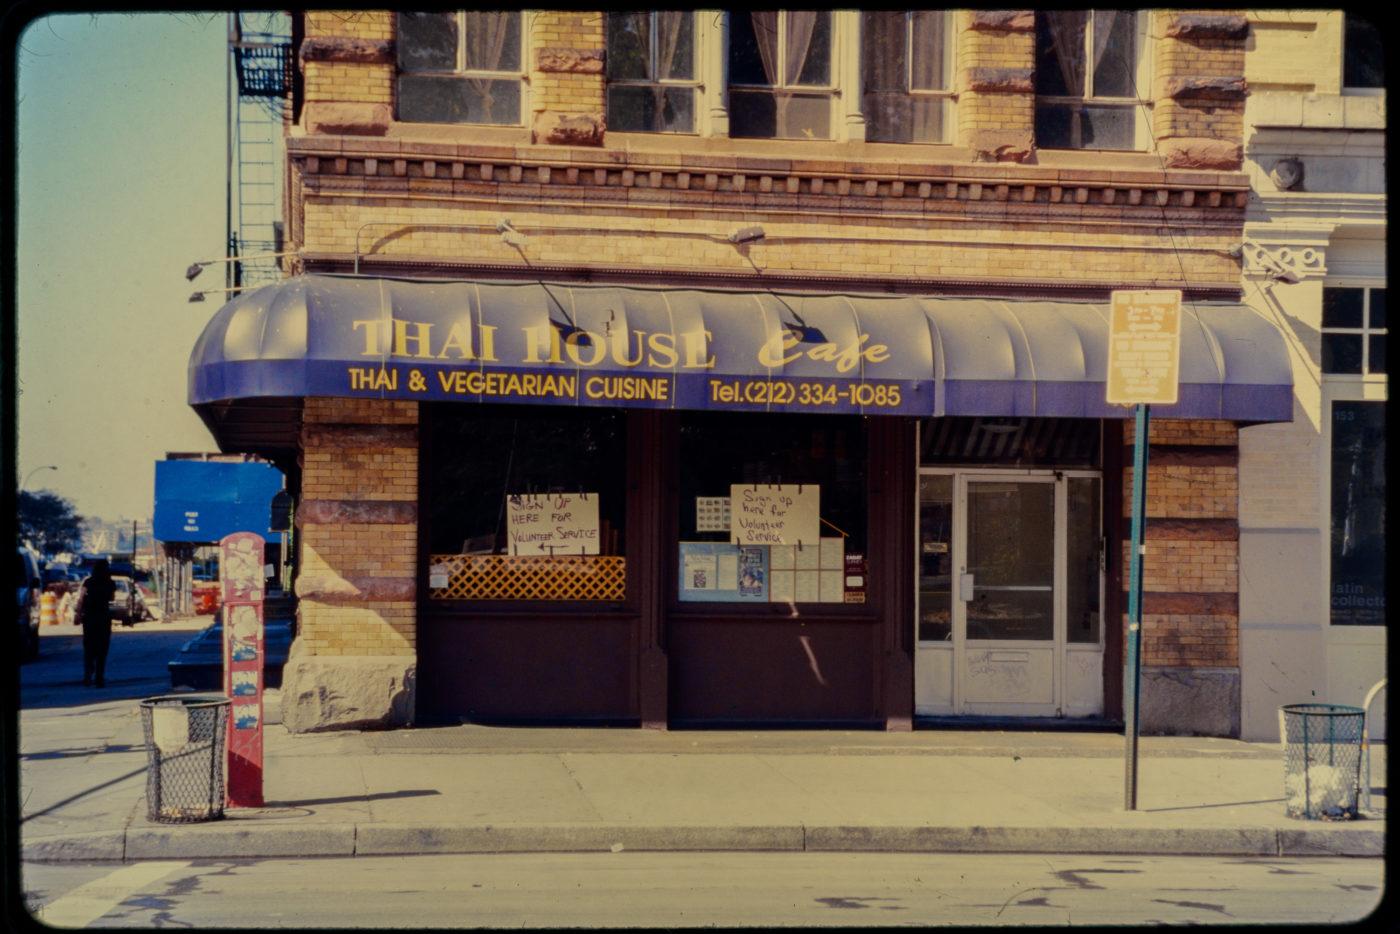 Thai House Cafe 151 Hudson Street.jpg